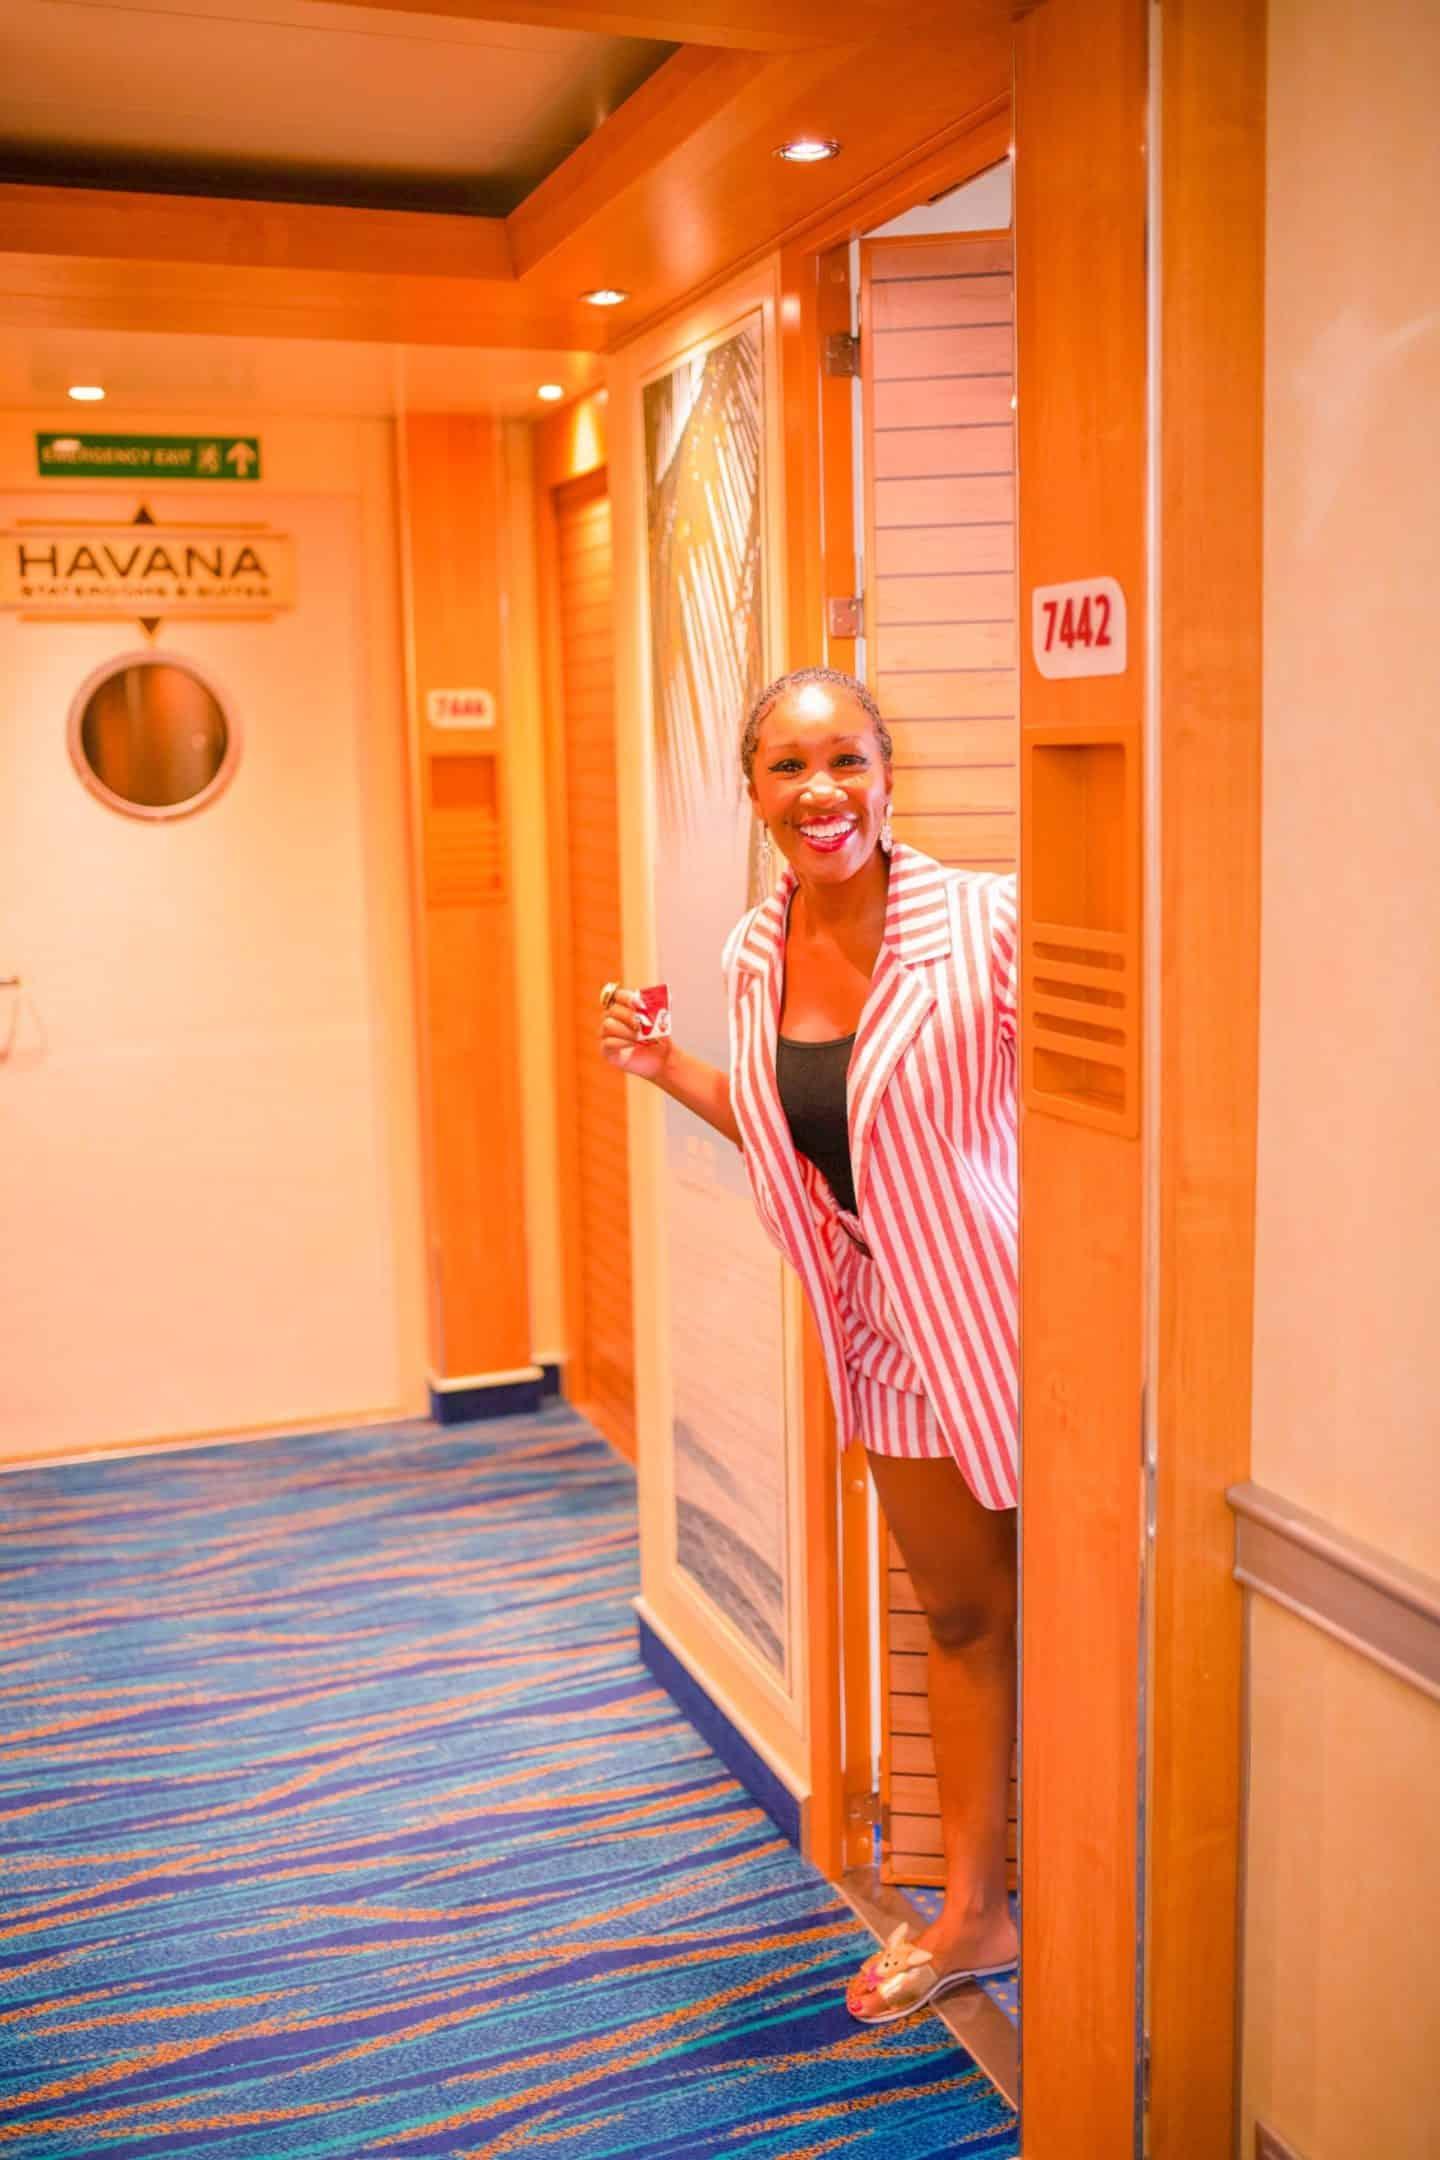 Carnival cruise ship Vista Havana suites